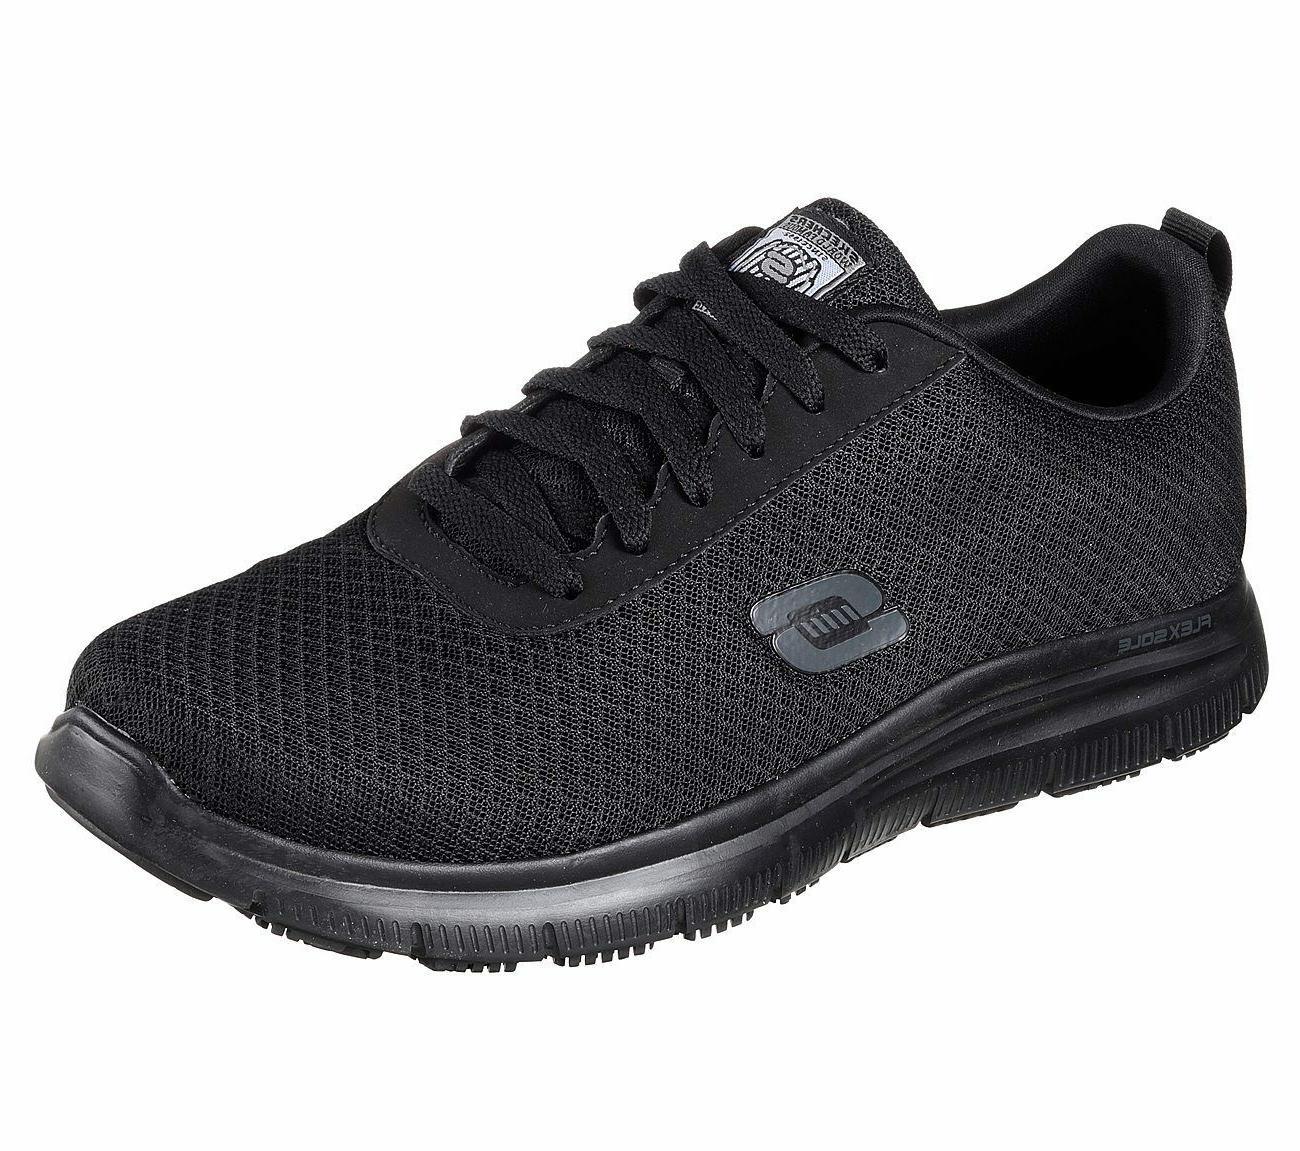 77125 black shoes work men comfort mesh